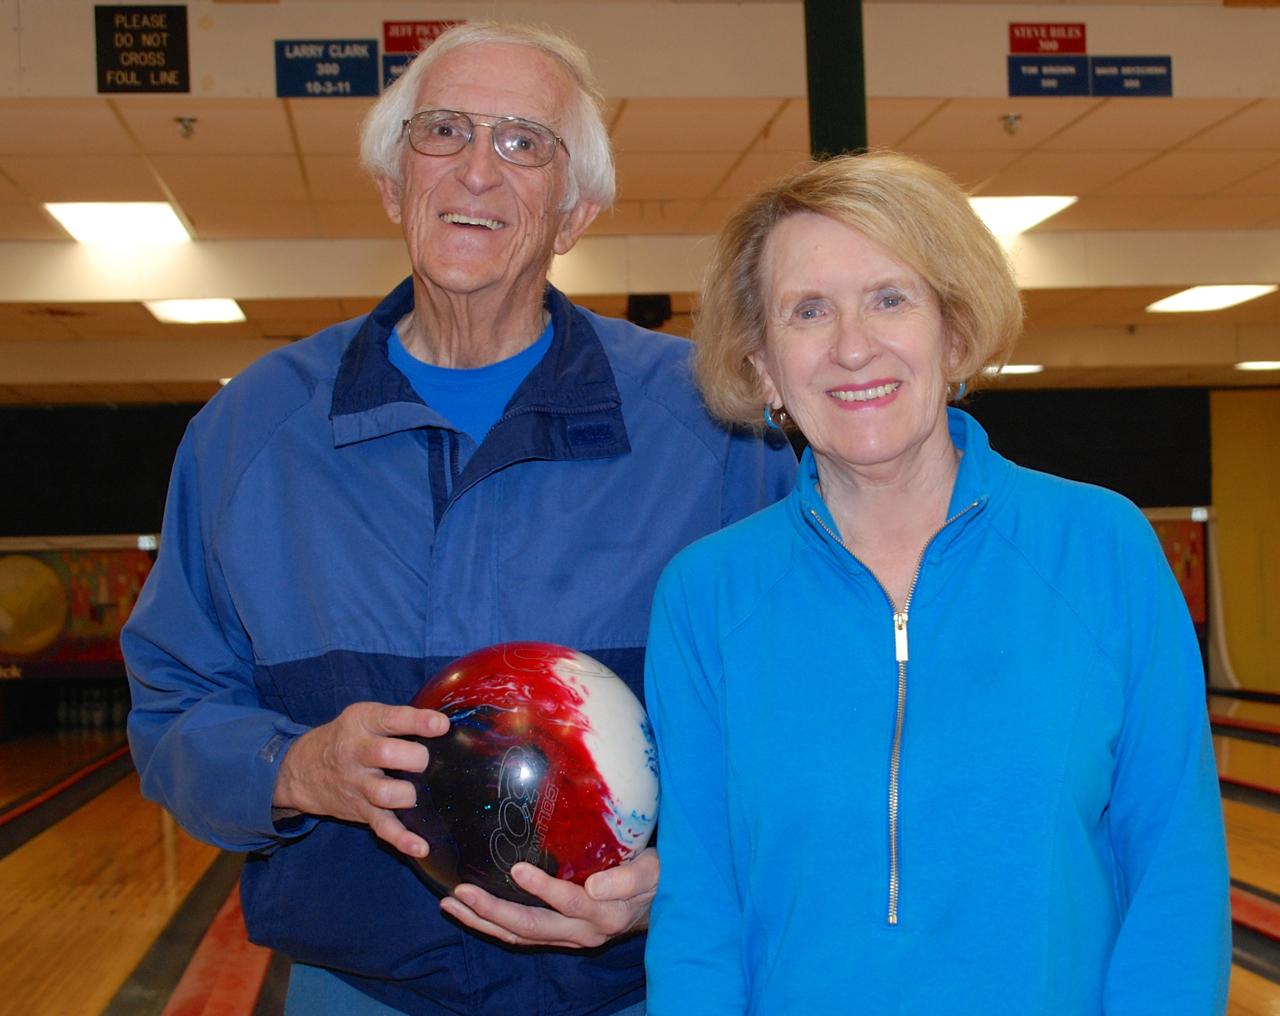 man and woman bowling at indian lane